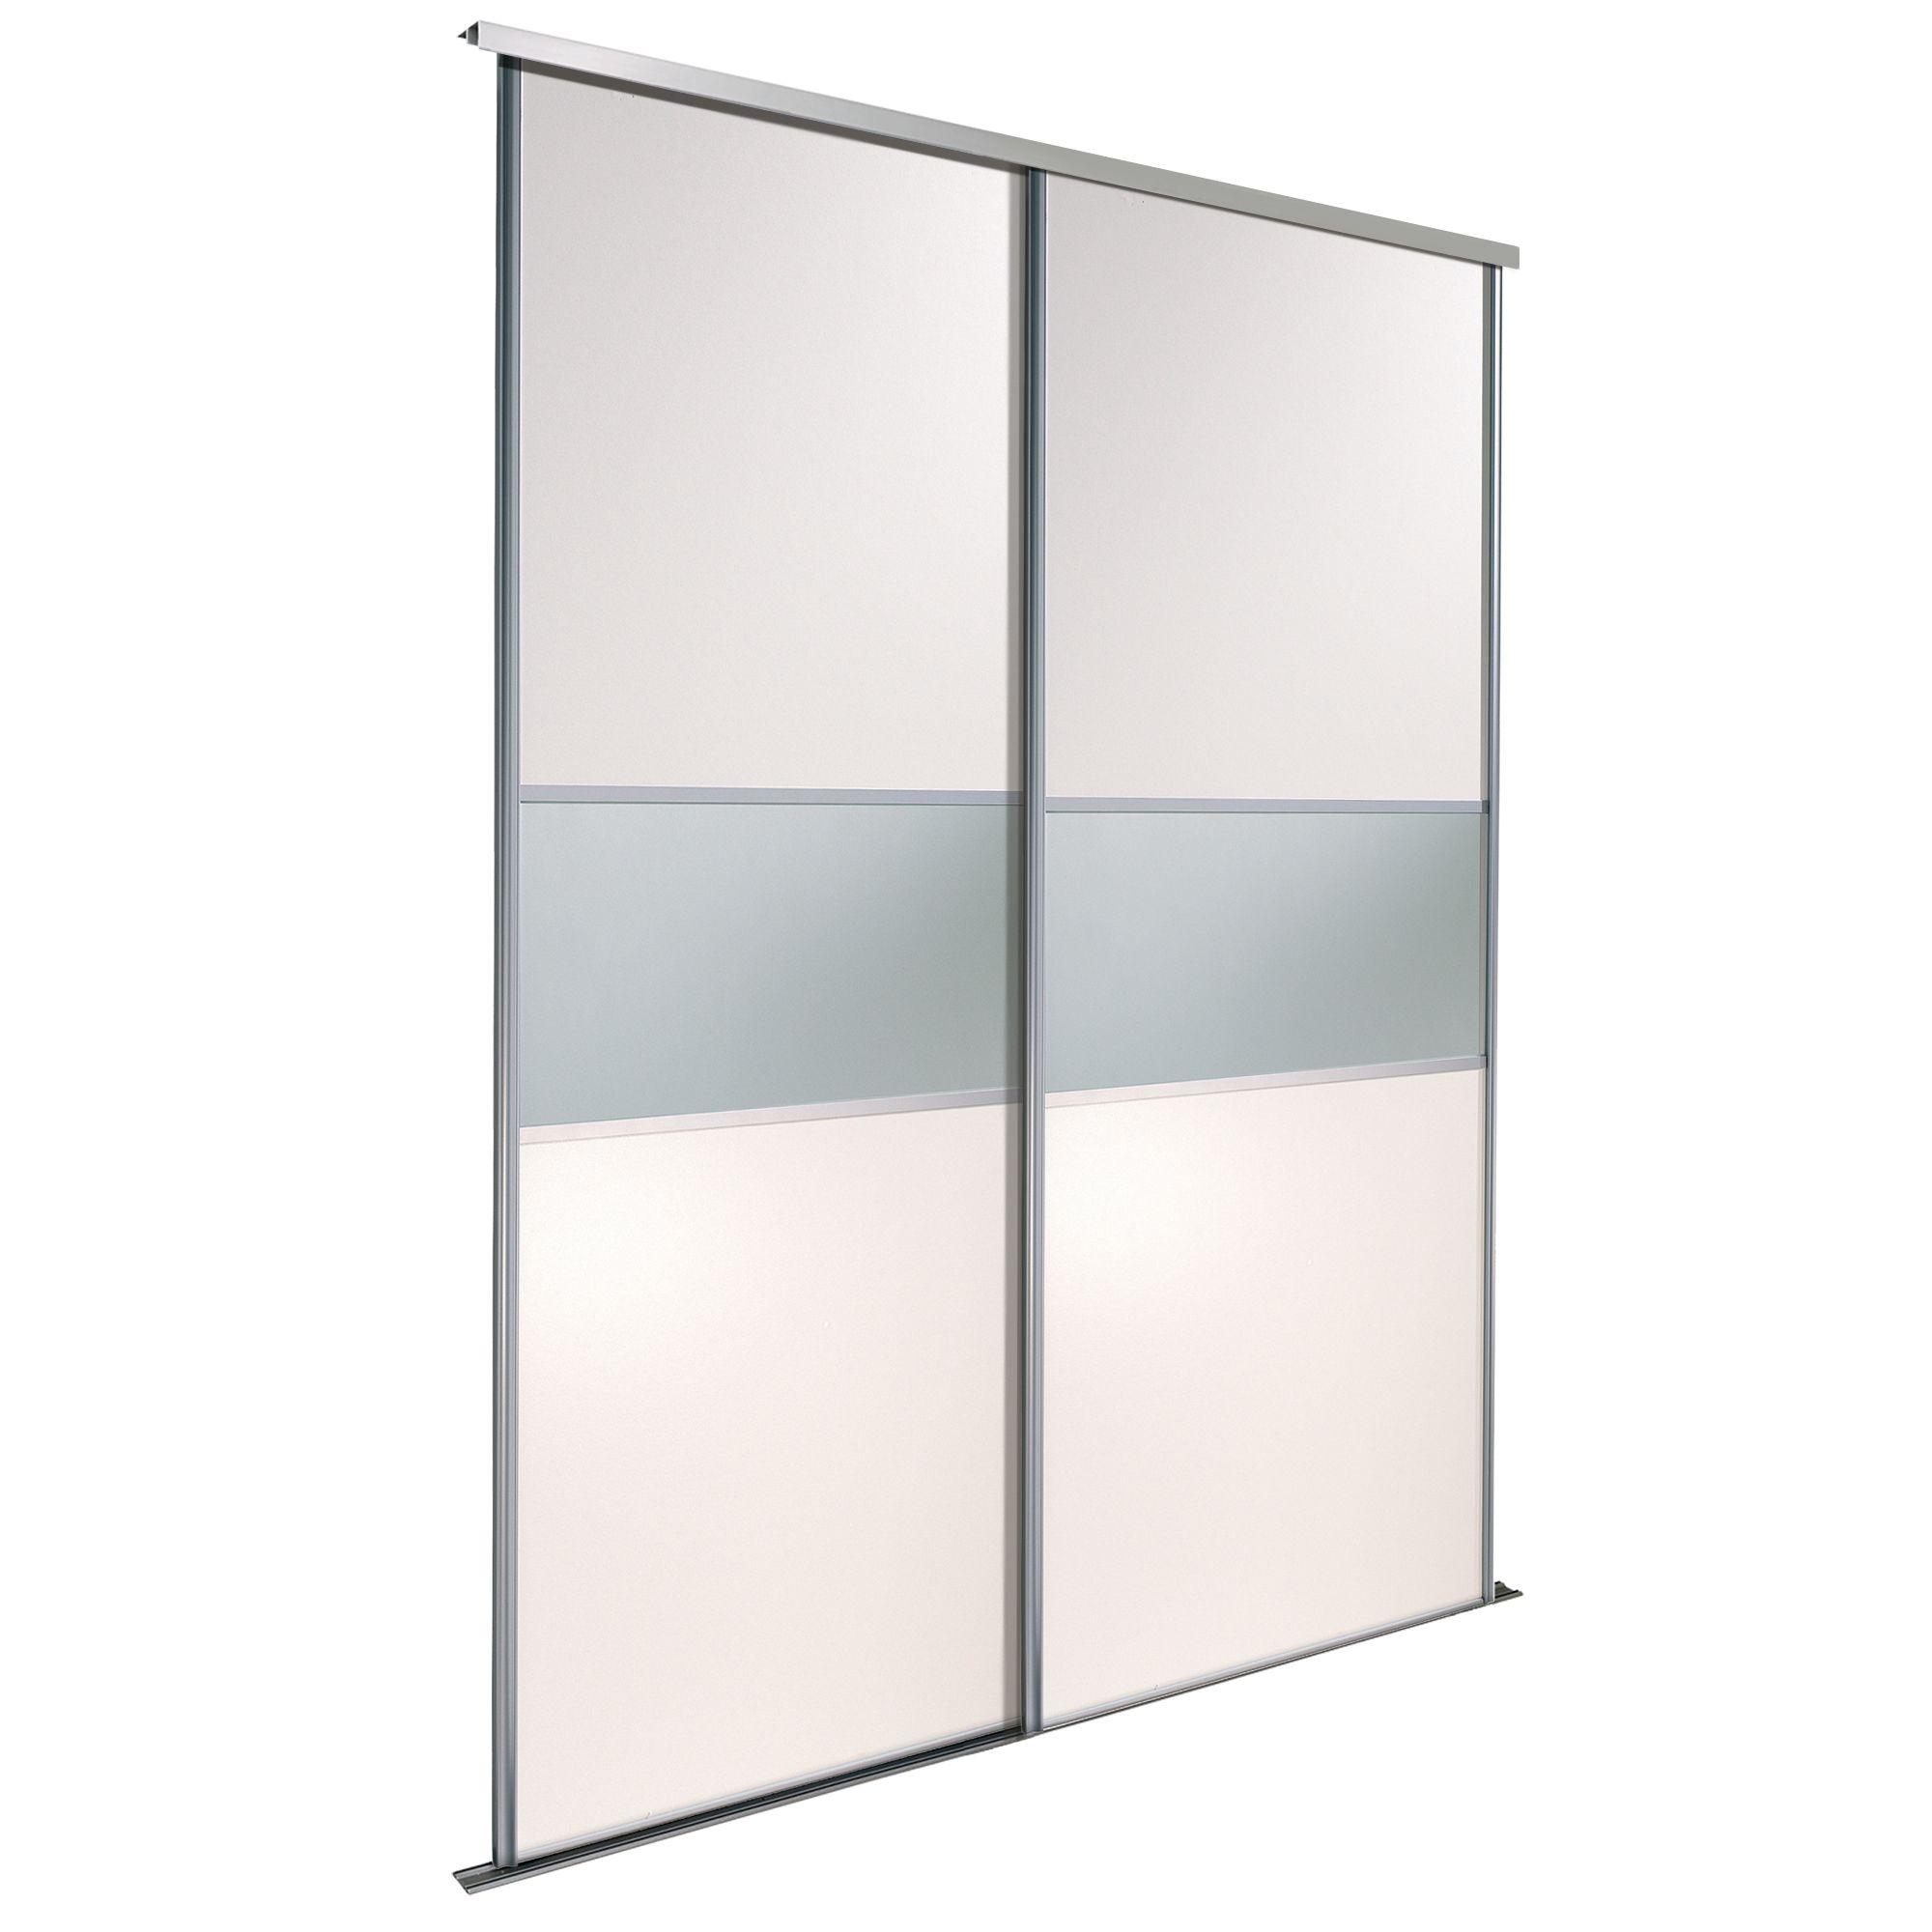 Fineline White Mirror Sliding Wardrobe Door Kit (h)2220 Mm (w)914 Mm, Pack Of 2